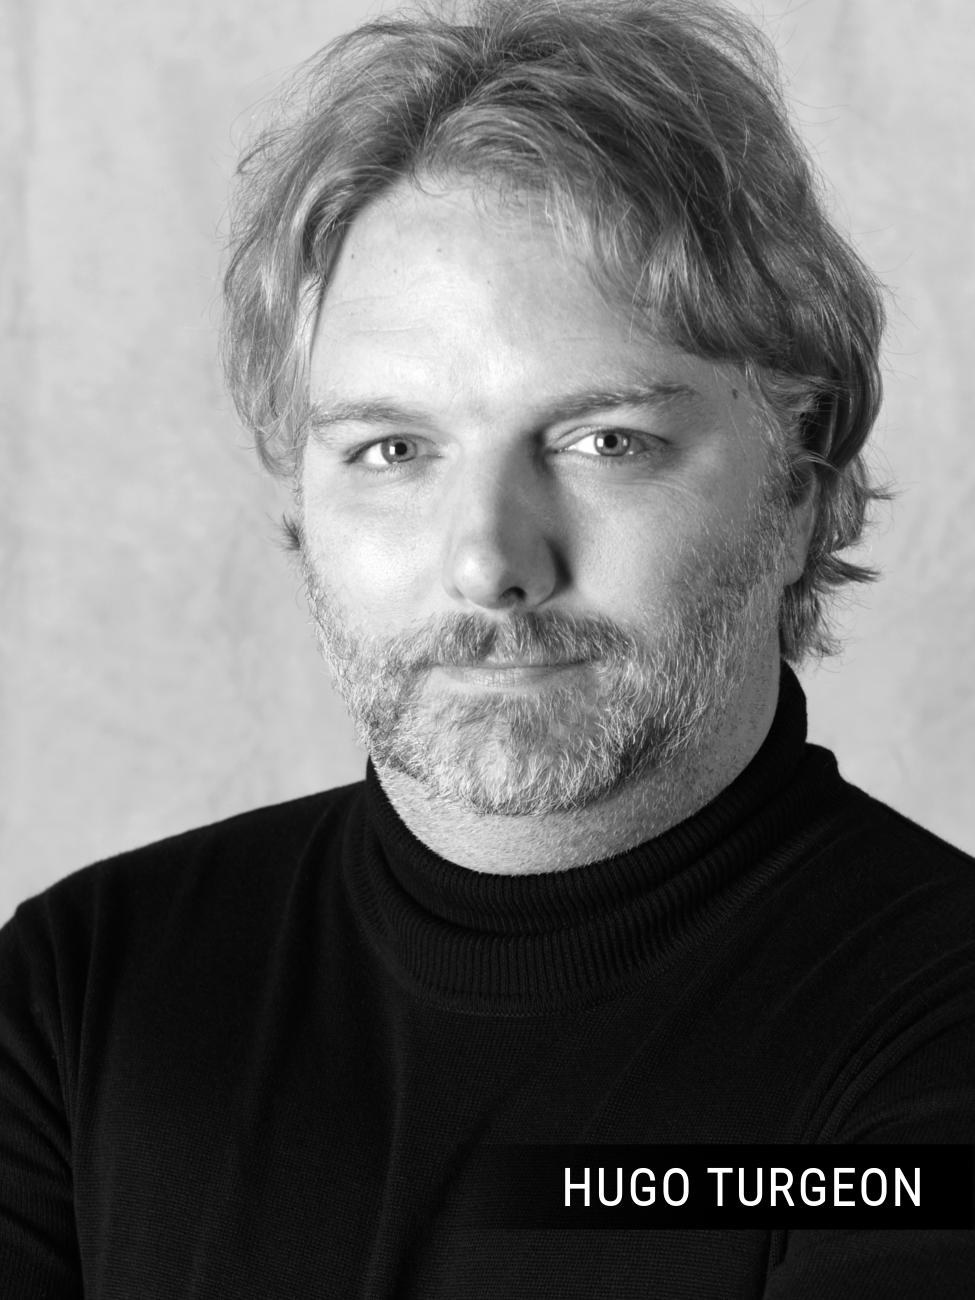 Hugo Turgeon